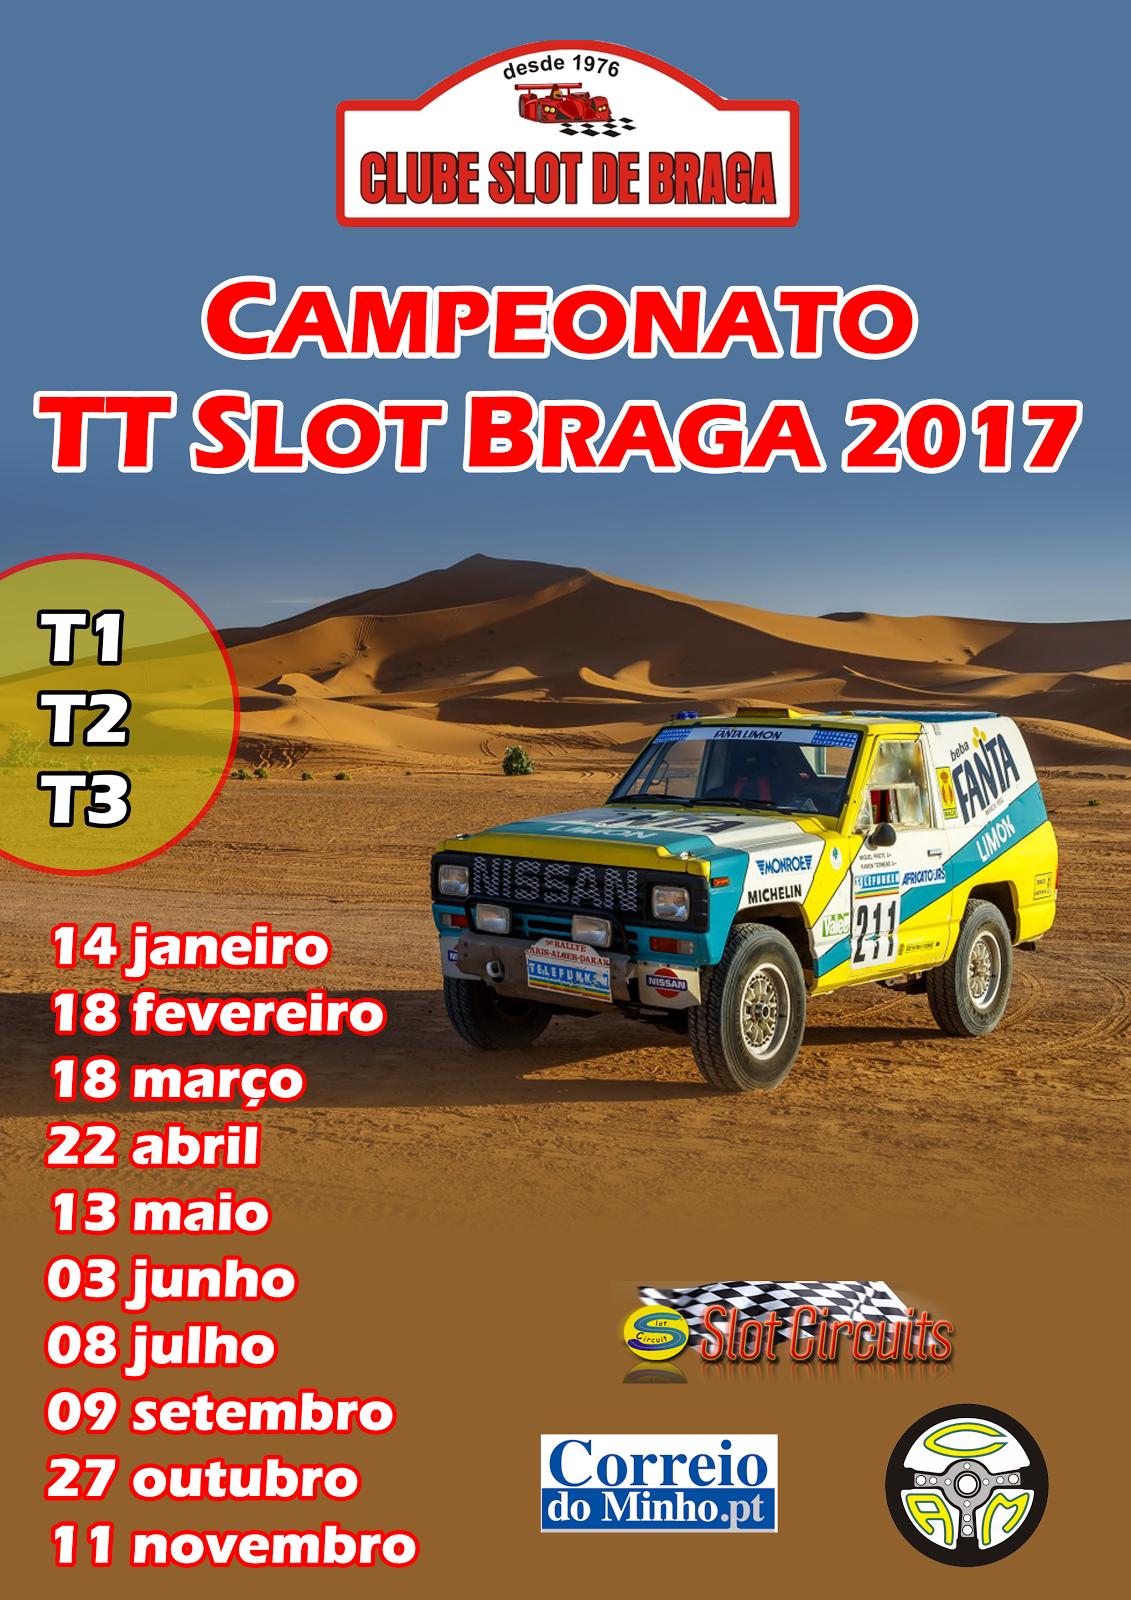 CAMPEONATO TT SLOT BRAGA 2017